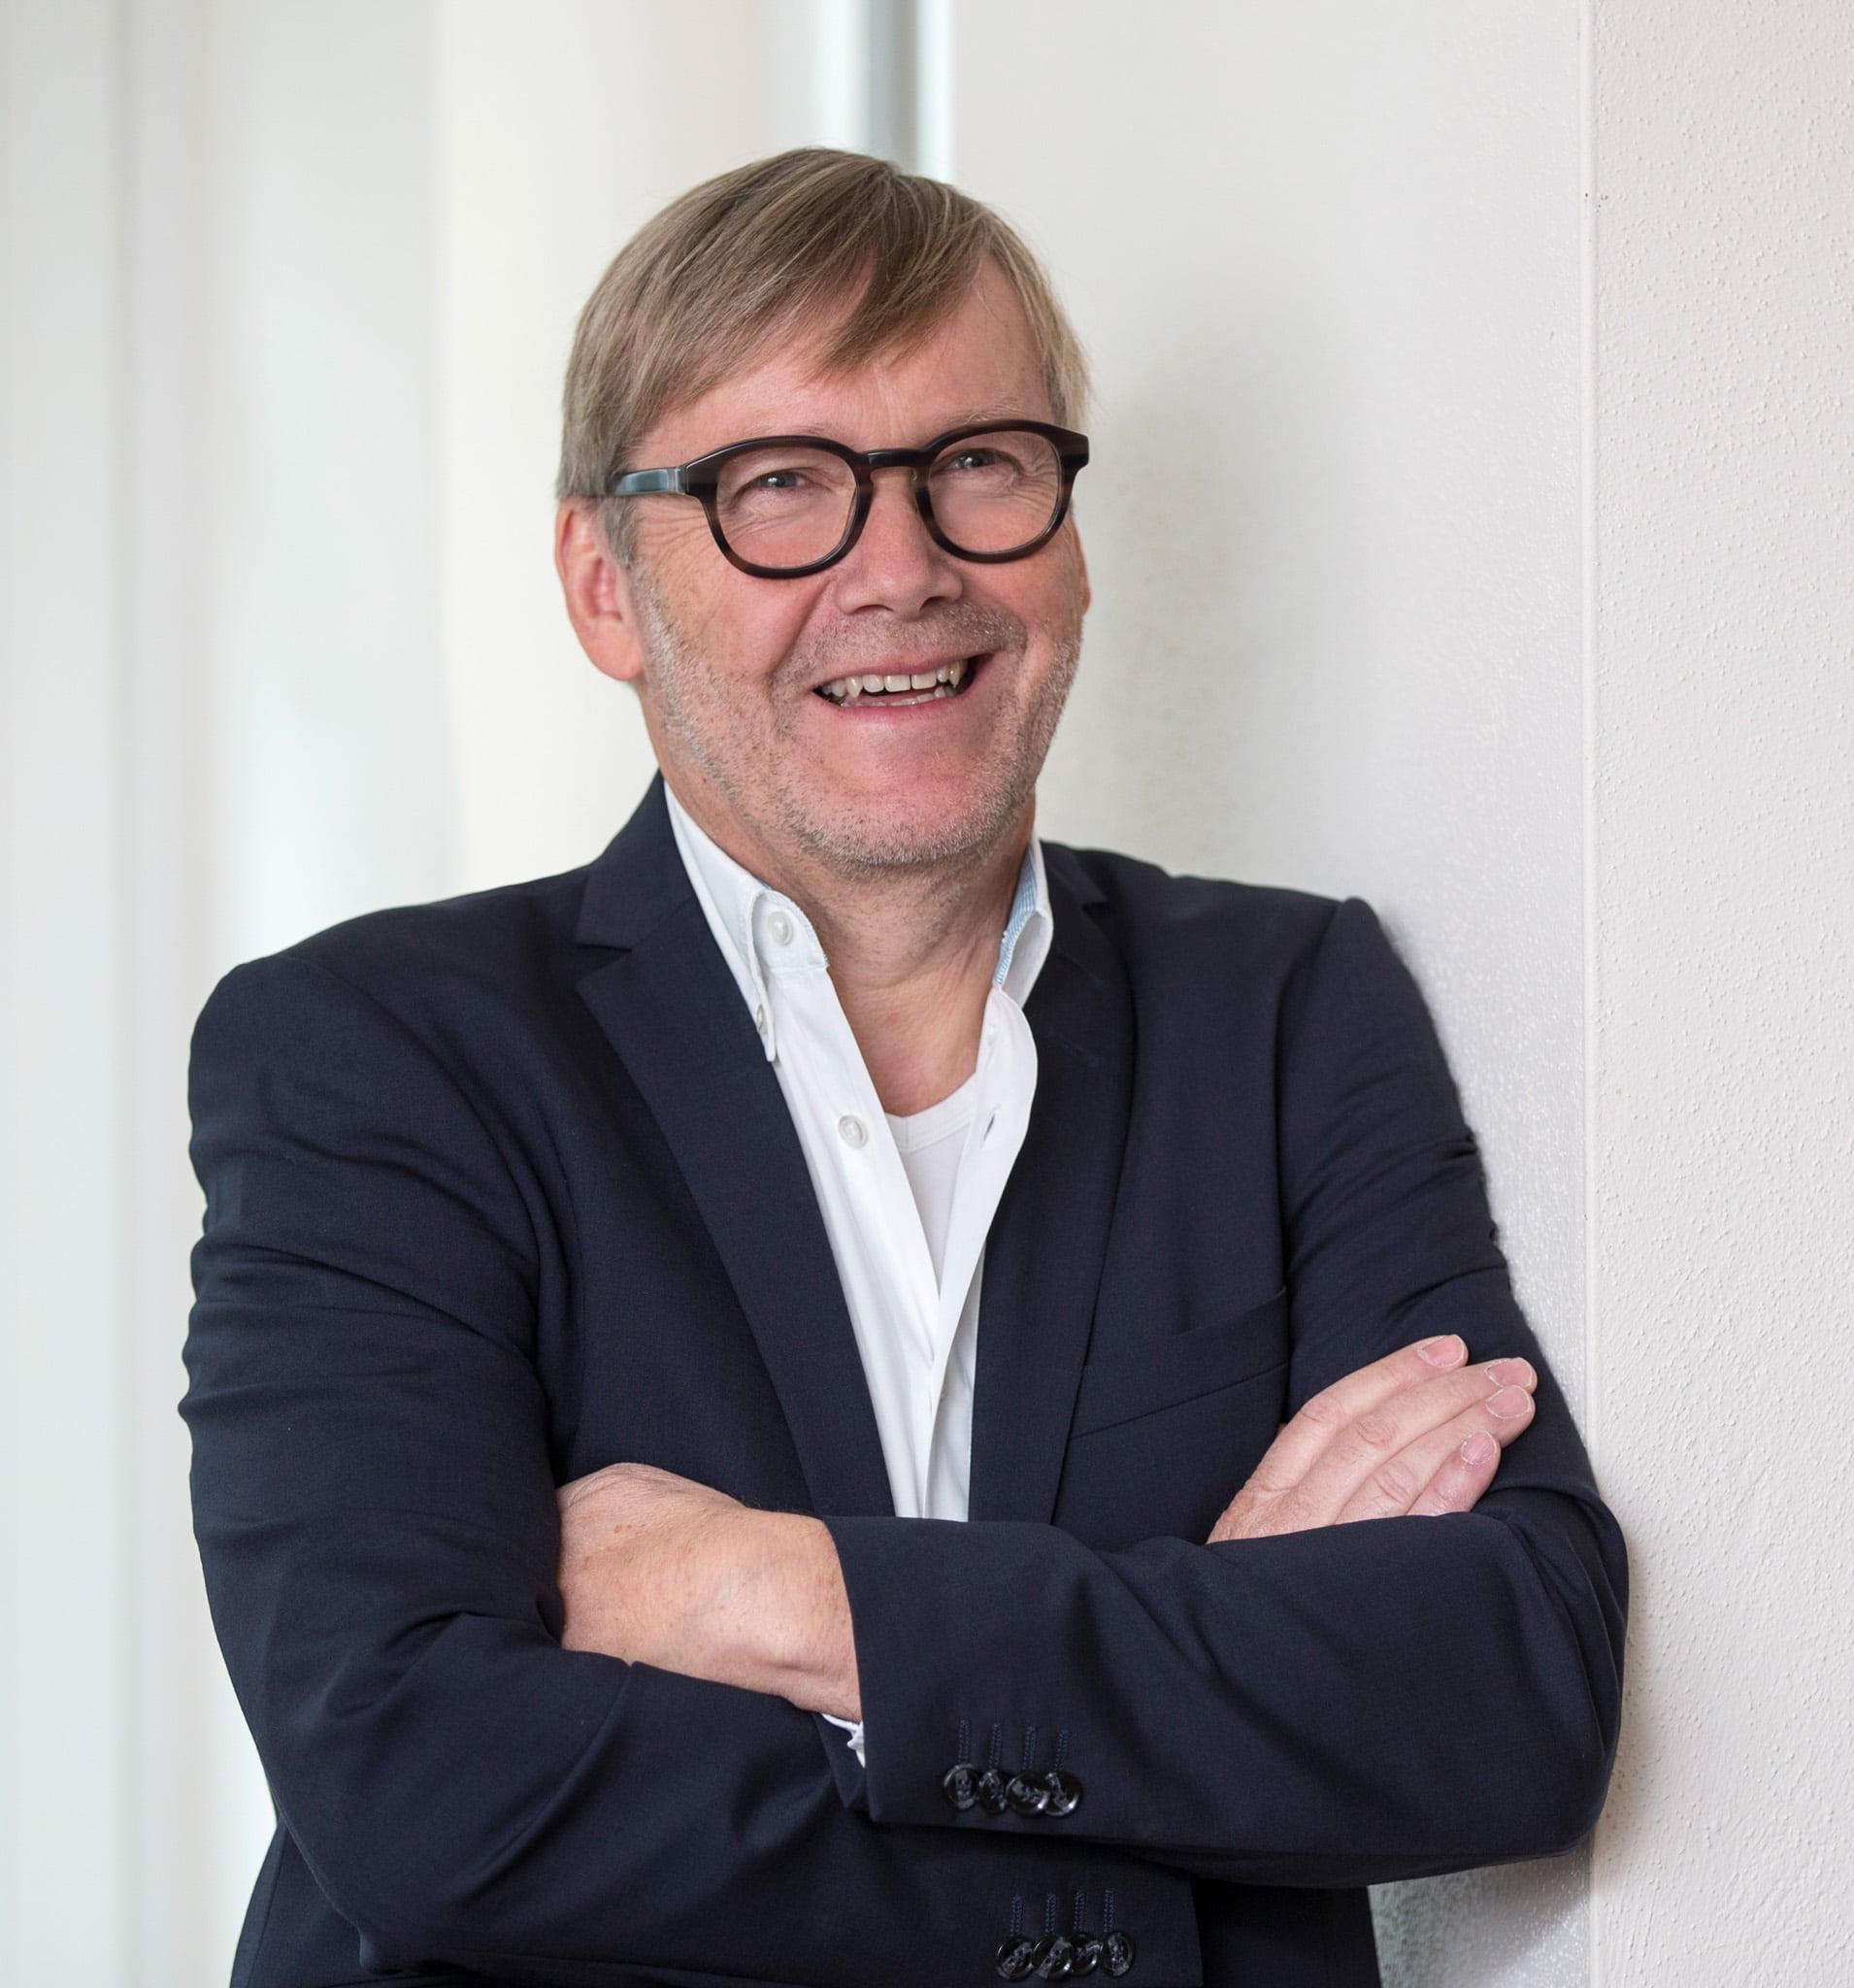 Matthias Kurchgässner